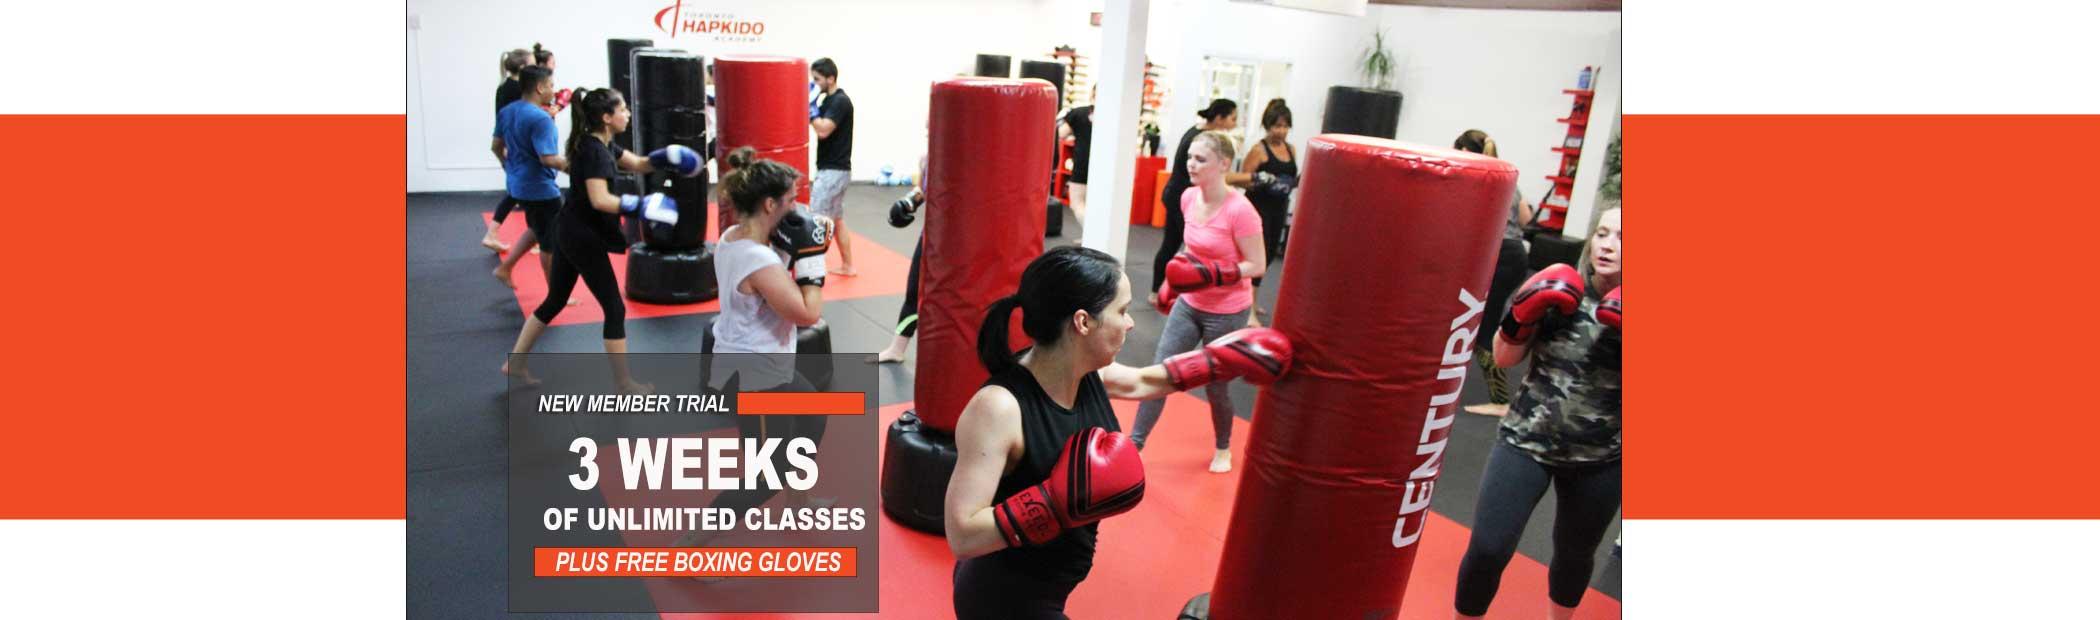 kickboxing north york school